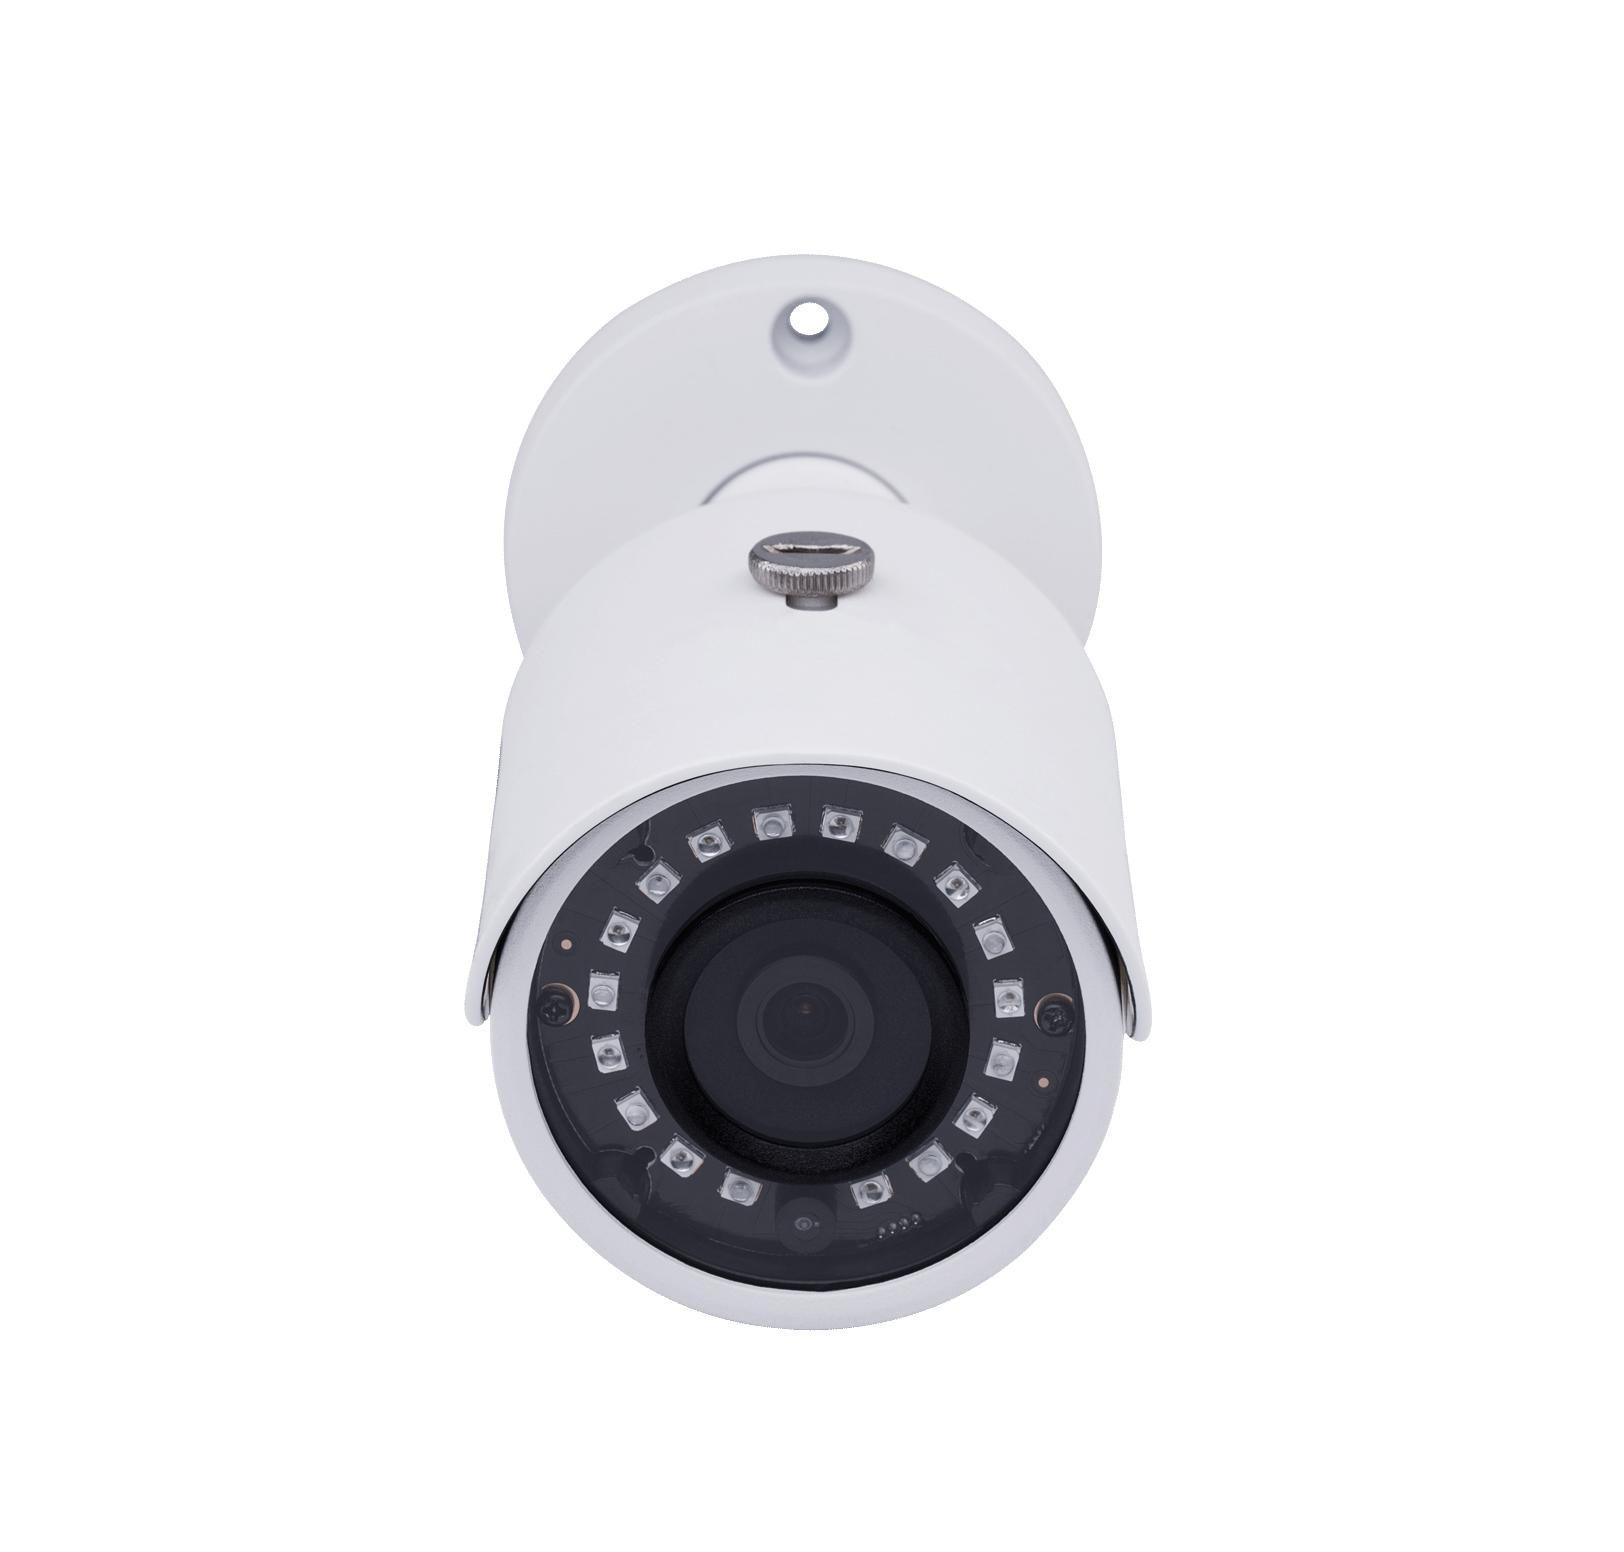 VHD 5240 B Starlight Câmera HDCVI Intelbras